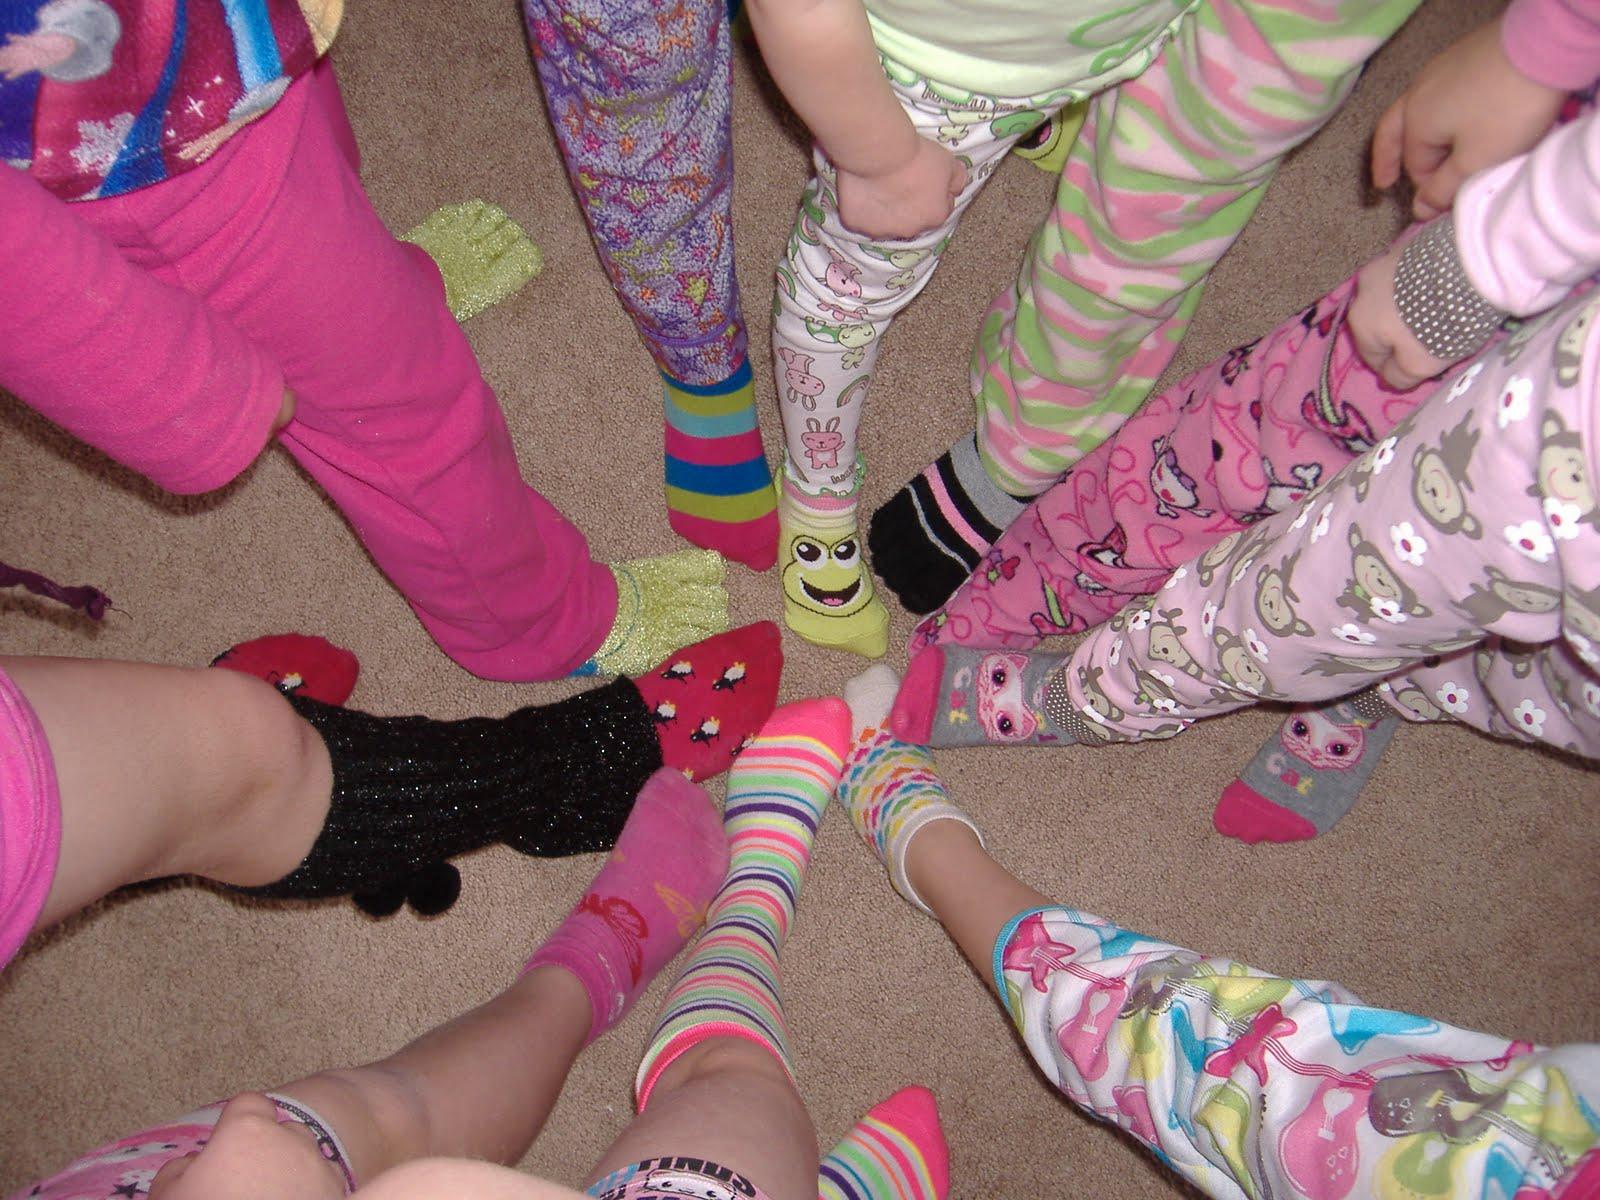 girls-pull-off-pants-at-slumber-party-teen-facial-dripping